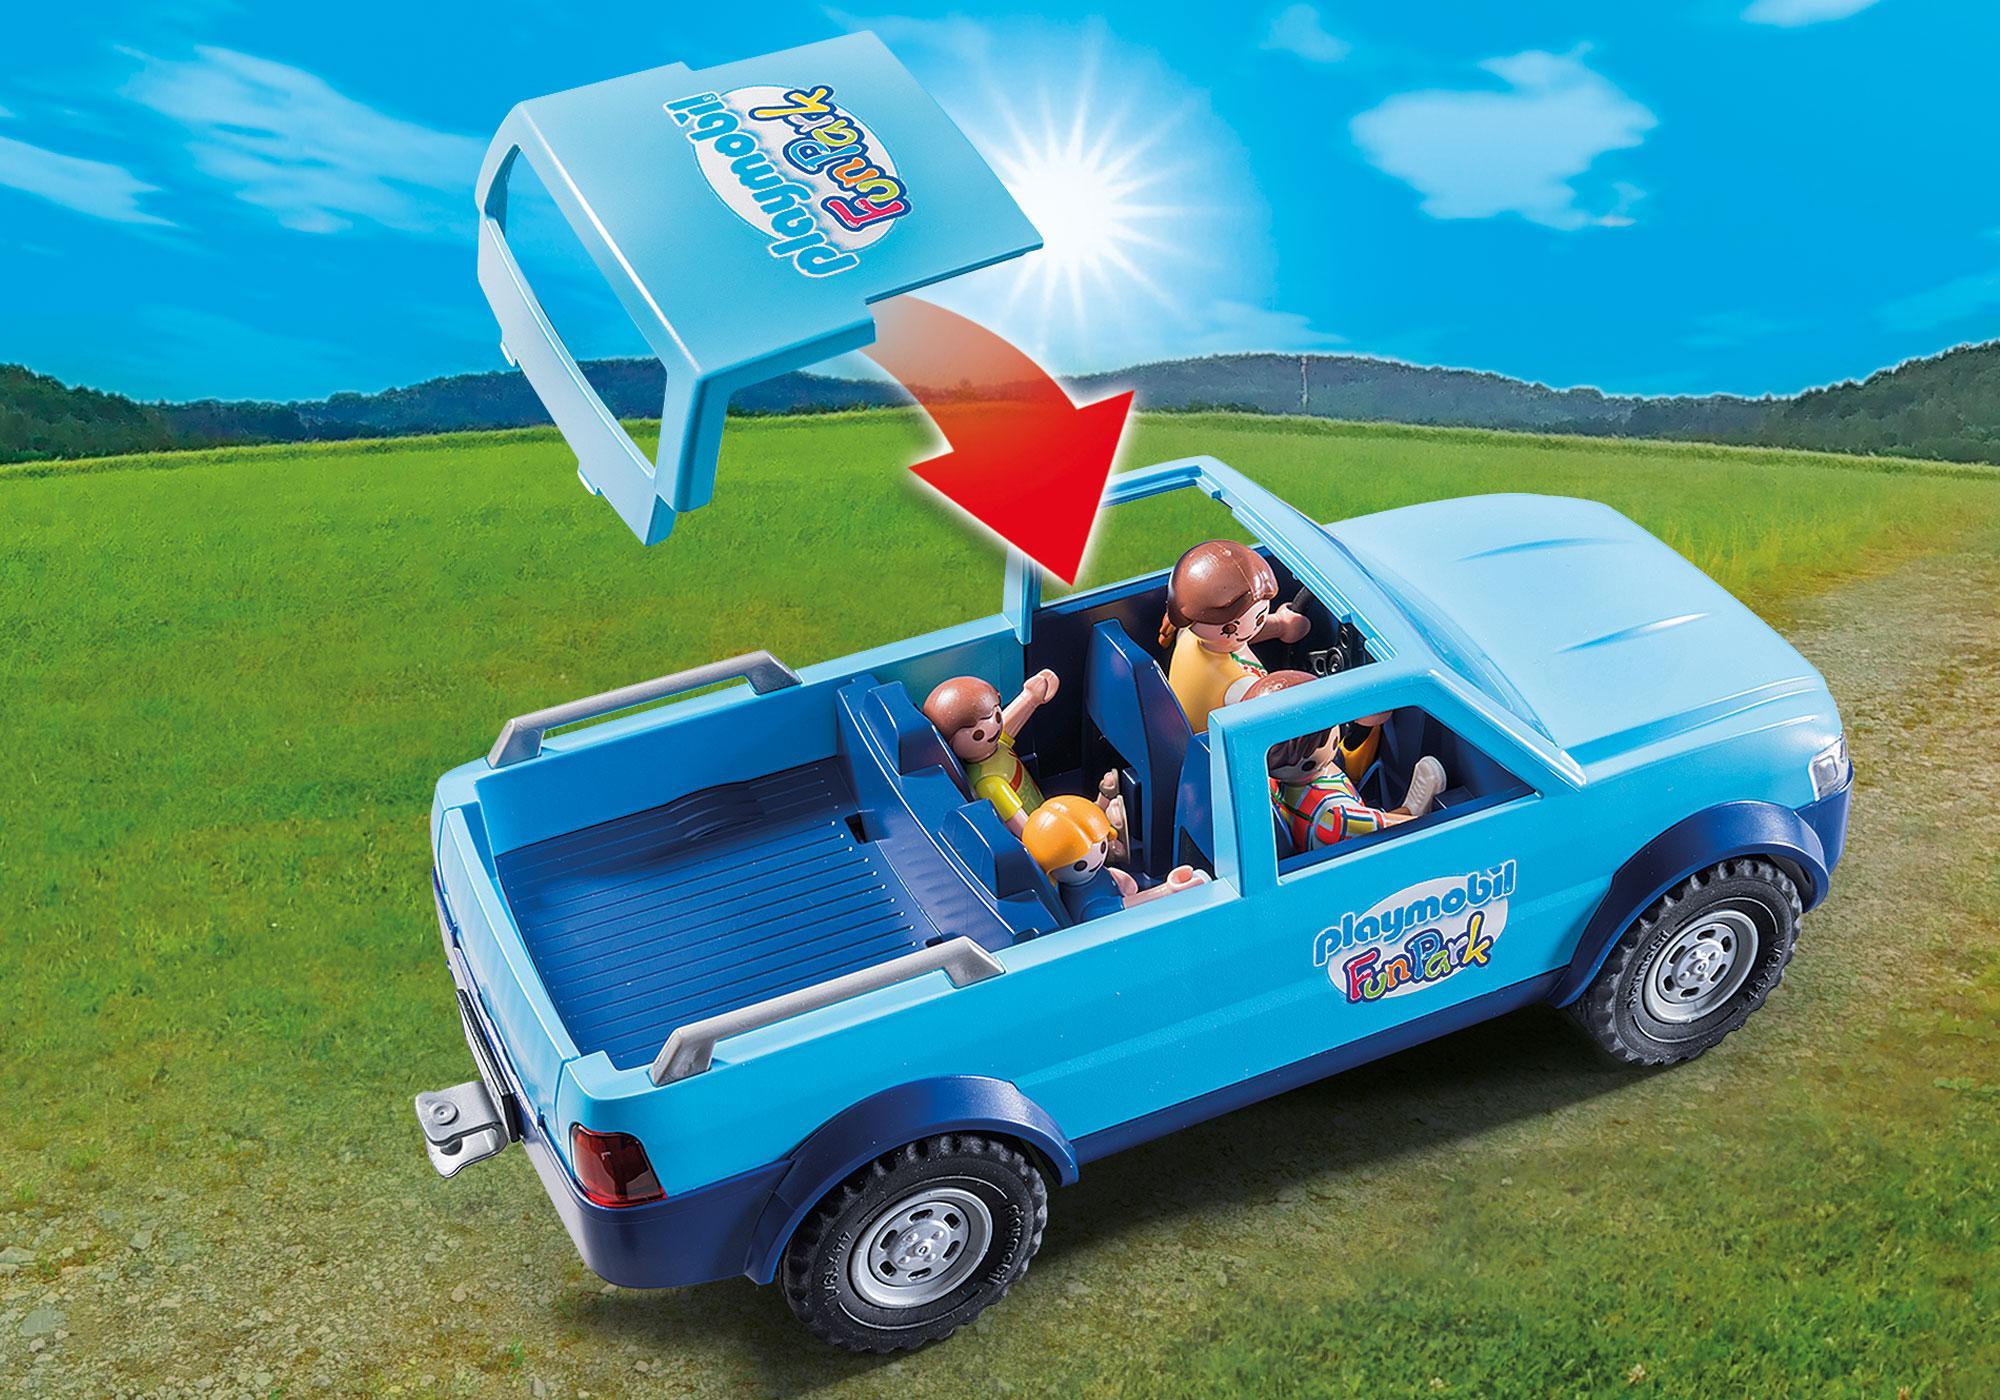 http://media.playmobil.com/i/playmobil/9502_product_extra1/PLAYMOBIL-FunPark Pickup con Remolque